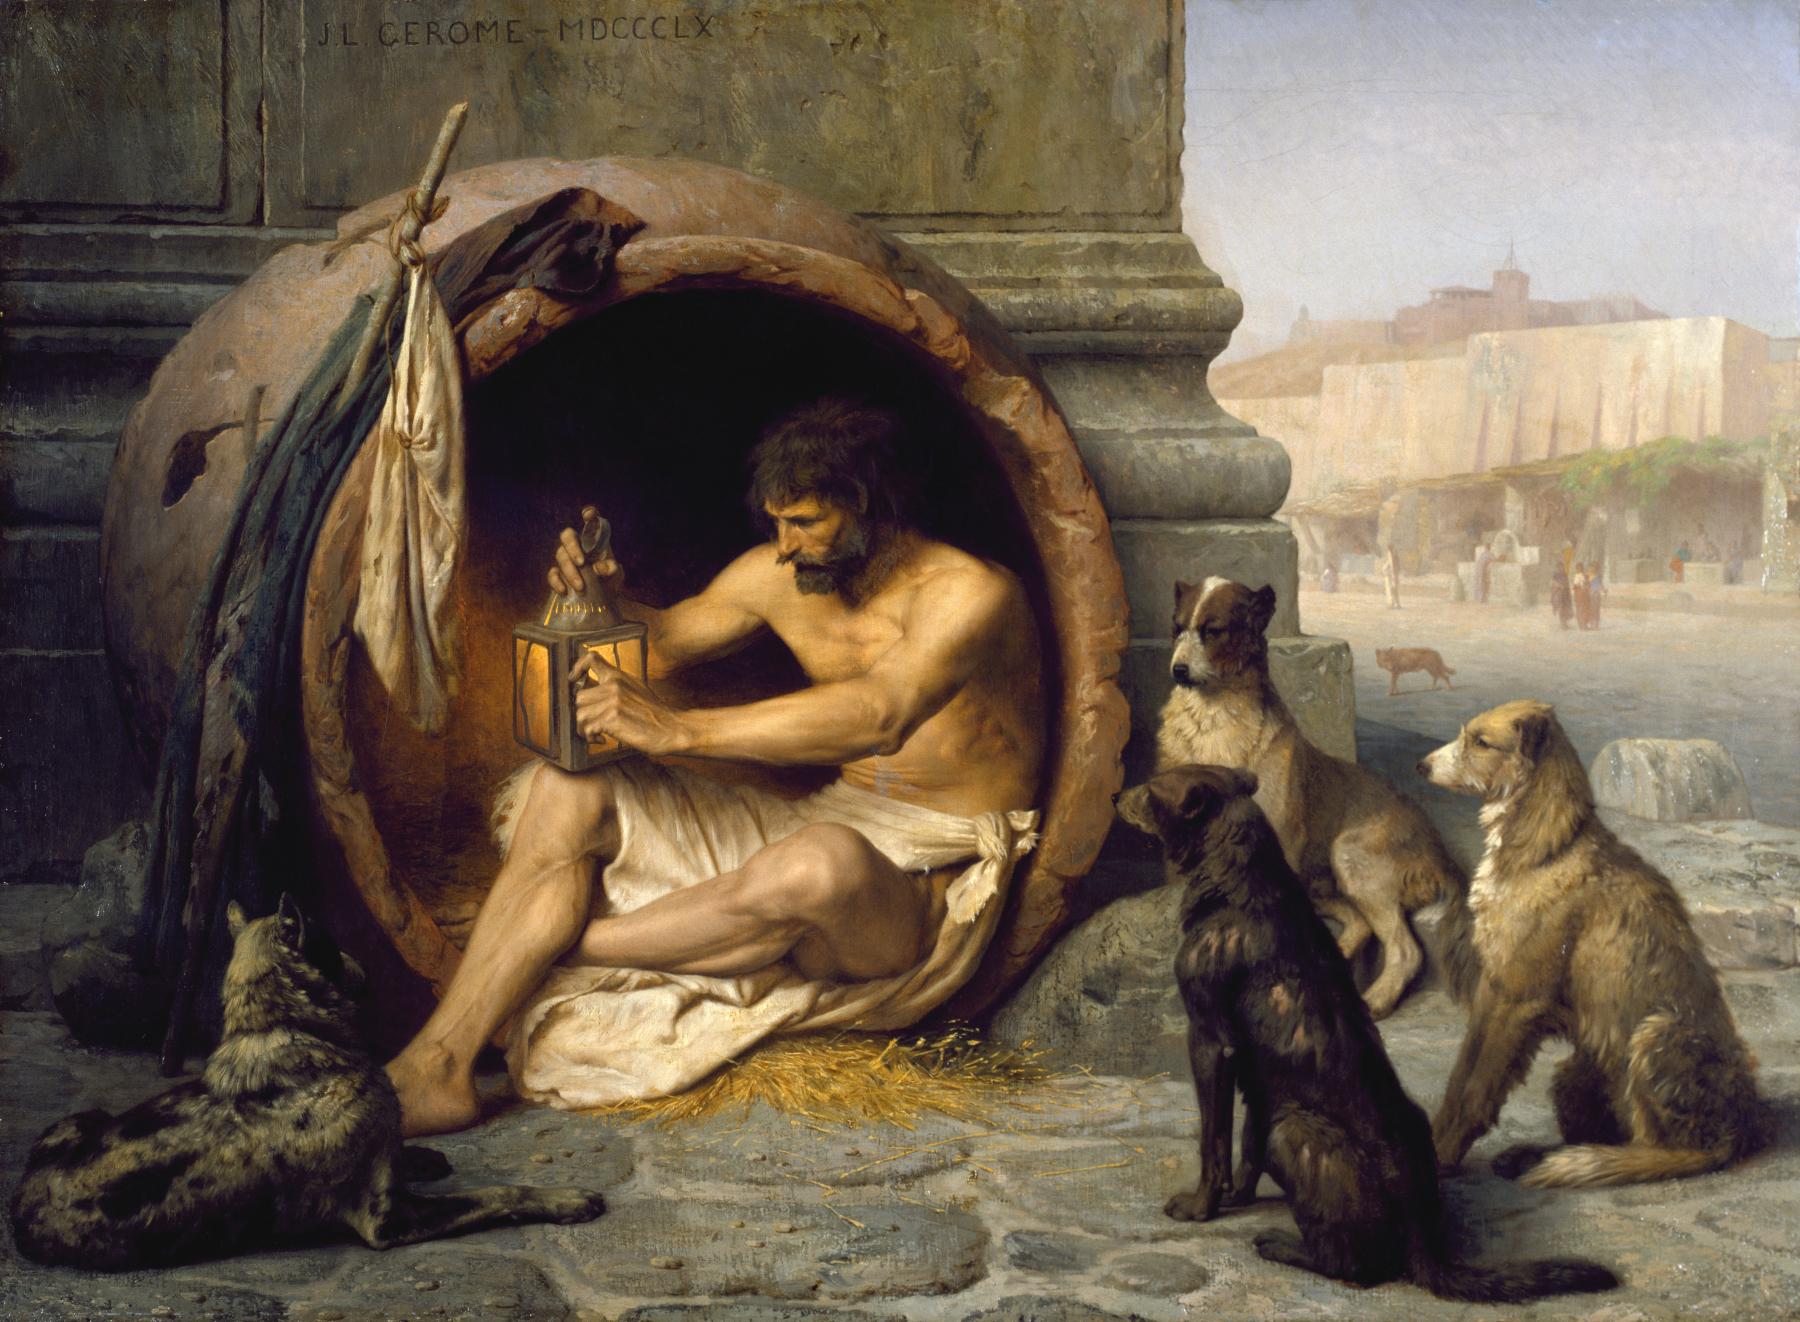 Jean-Léon_Gérôme_-_Diogenes_-_Walters_37131.jpg